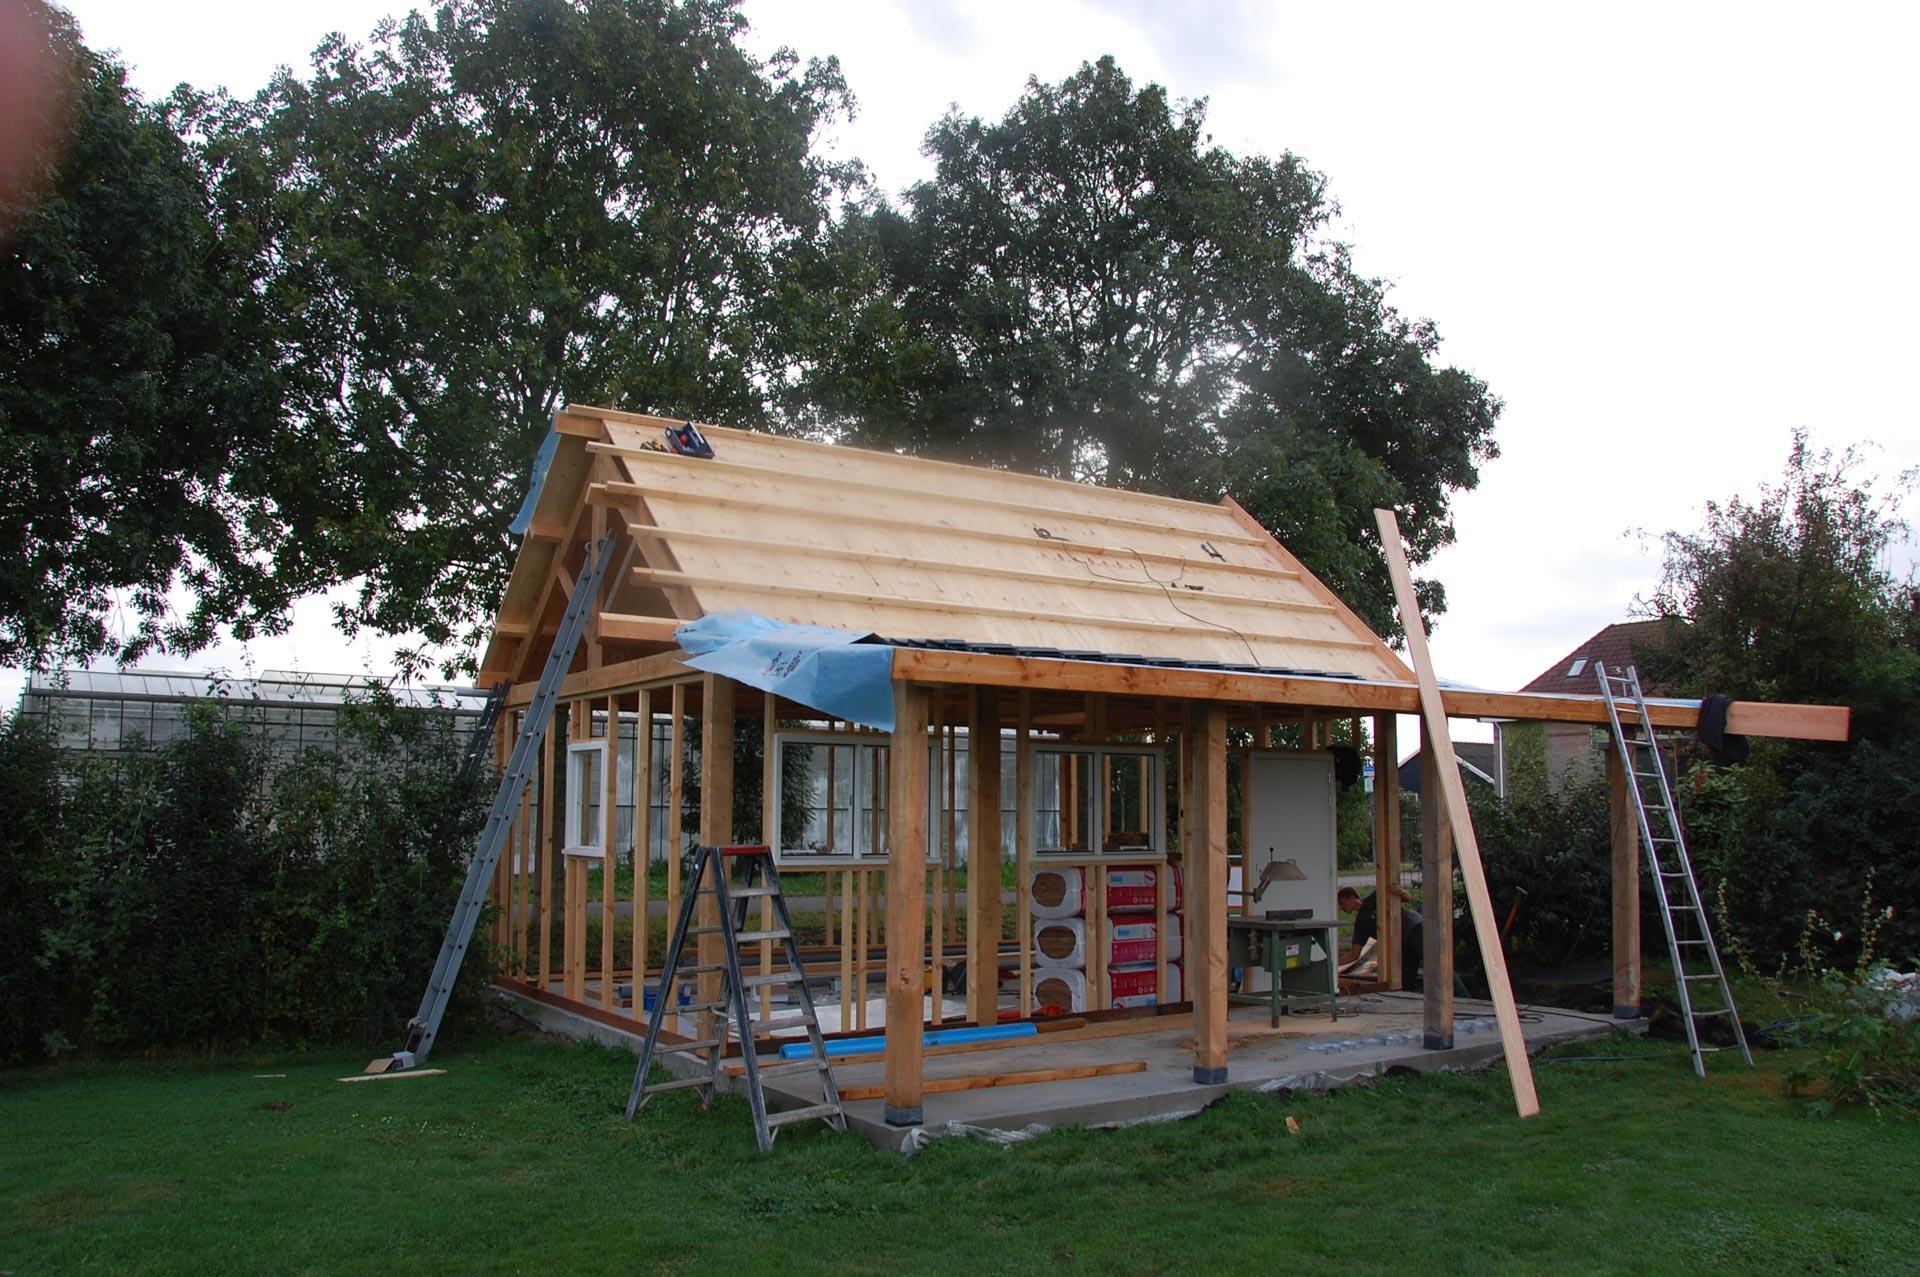 vos-hoveniers-project-tuinhuis-20